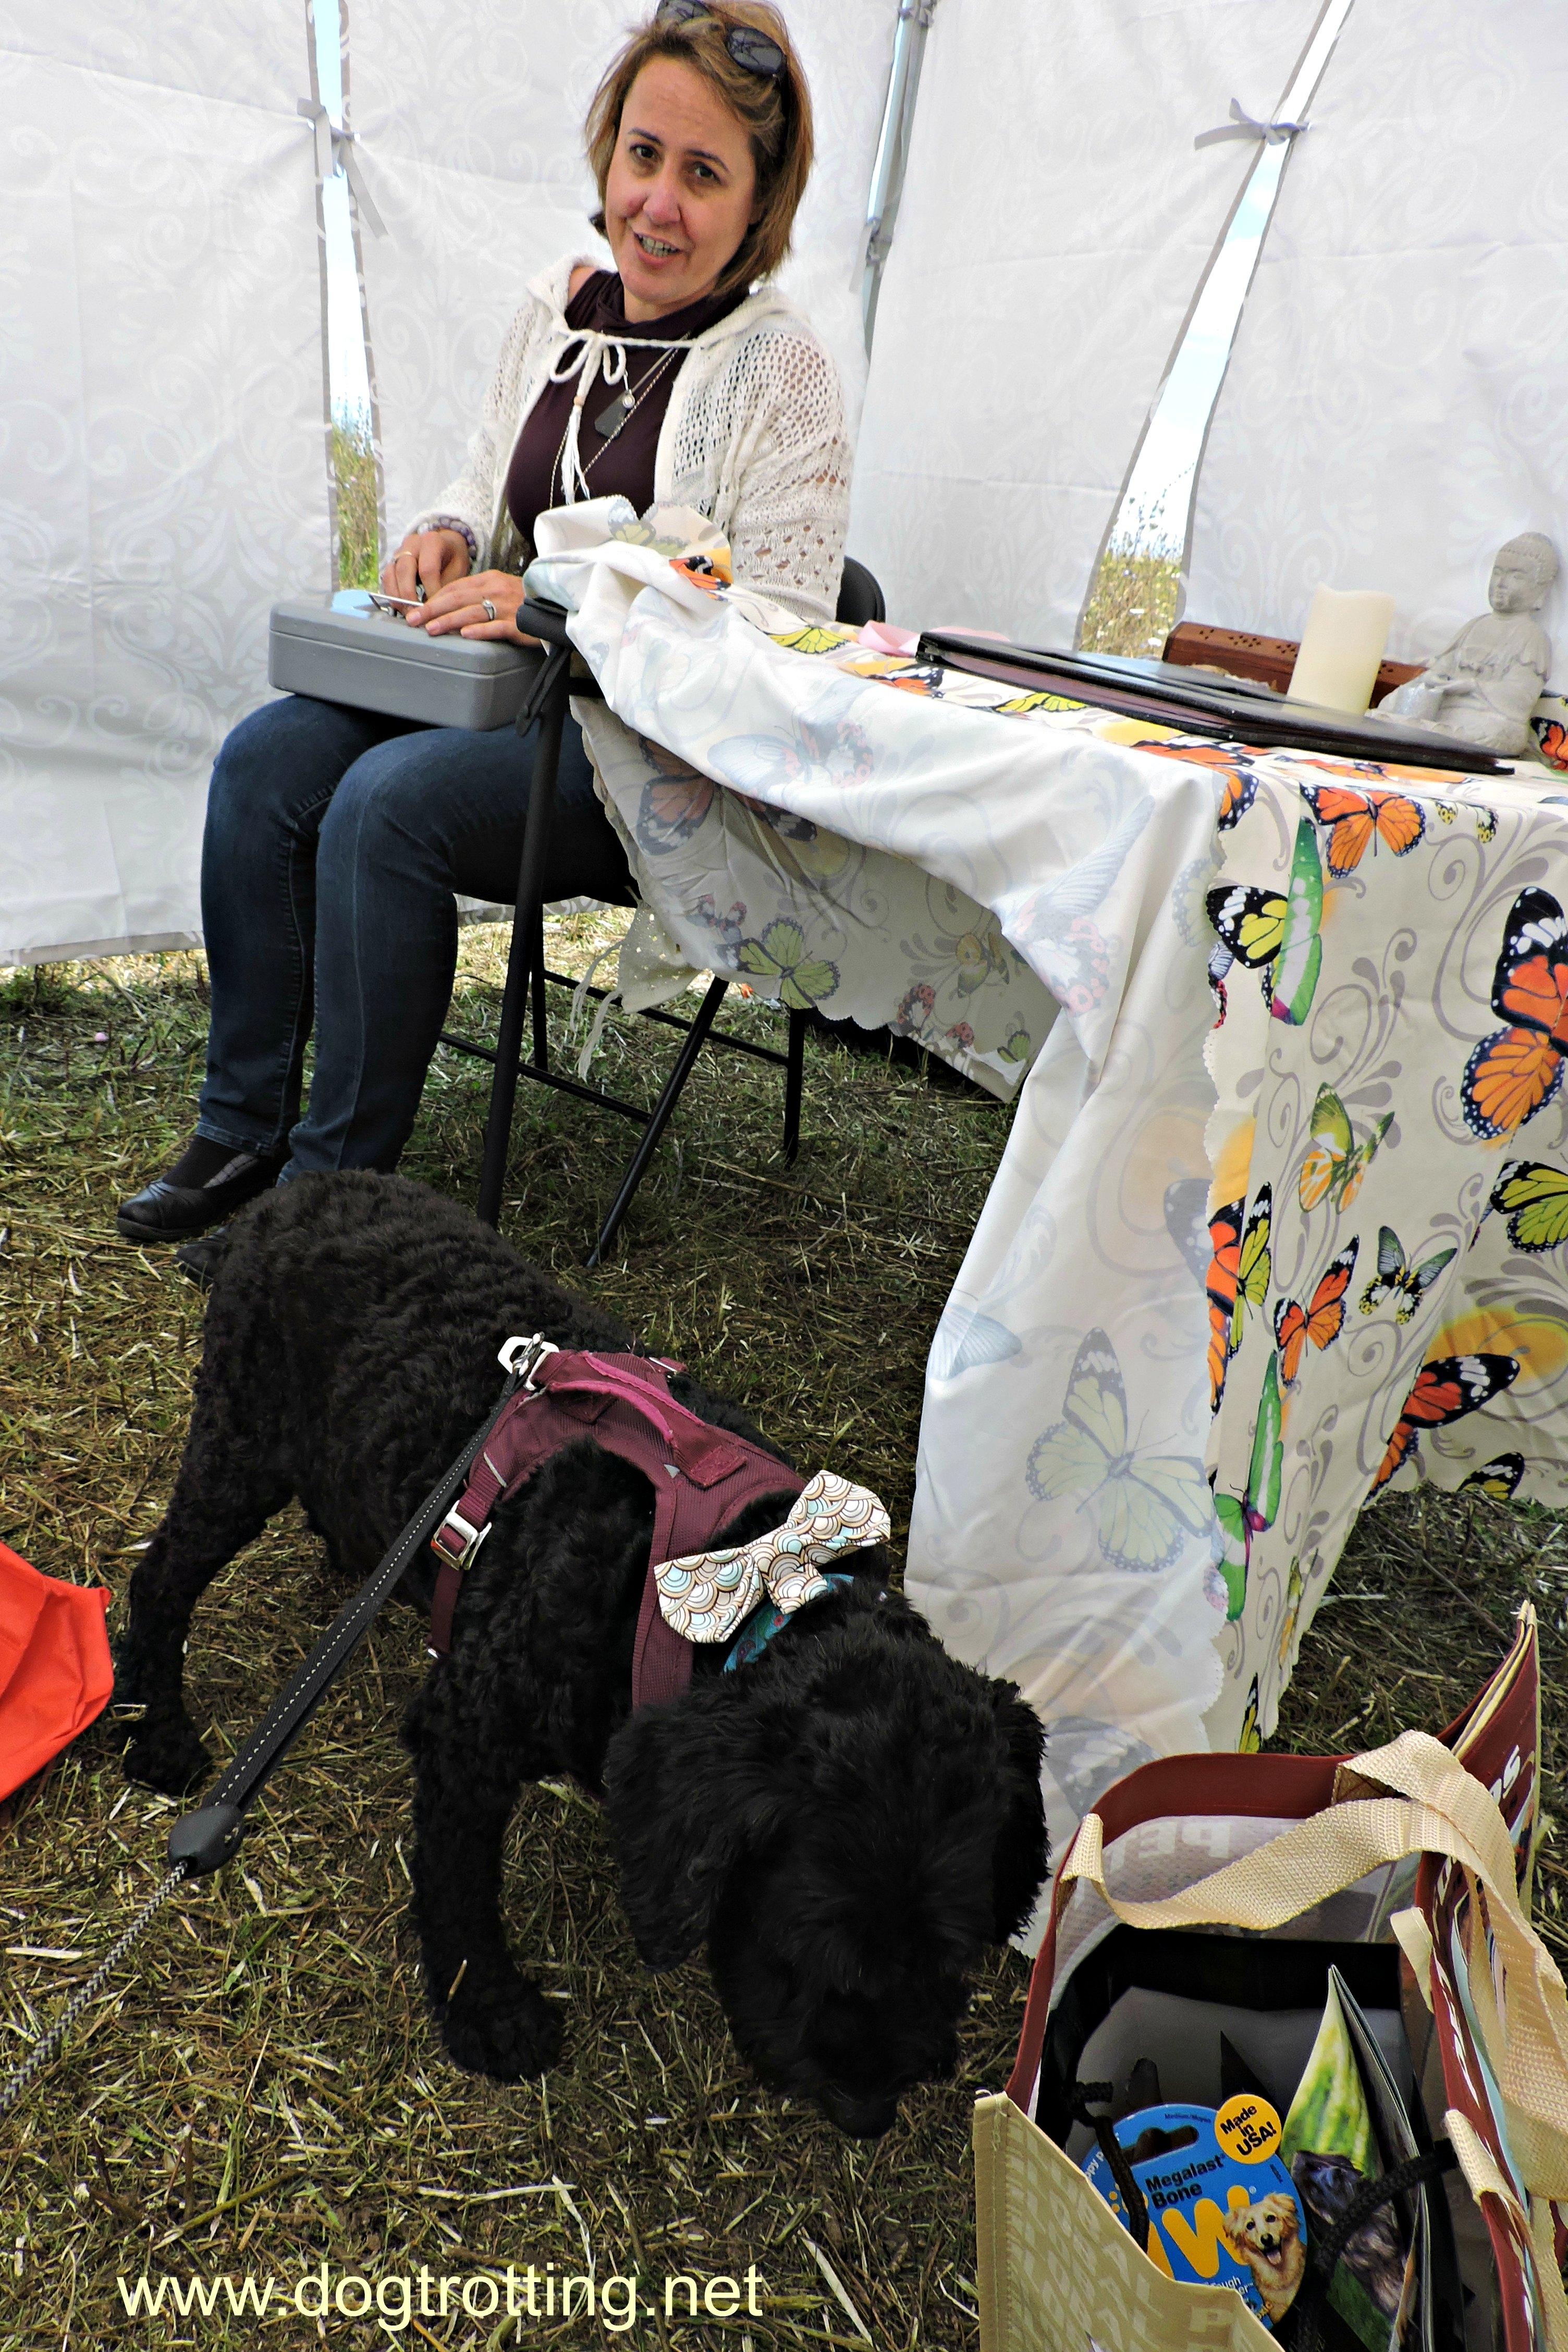 pet communicator and Victor at Stouffville Mutt Masquerade event 2017 dogtrotting.net